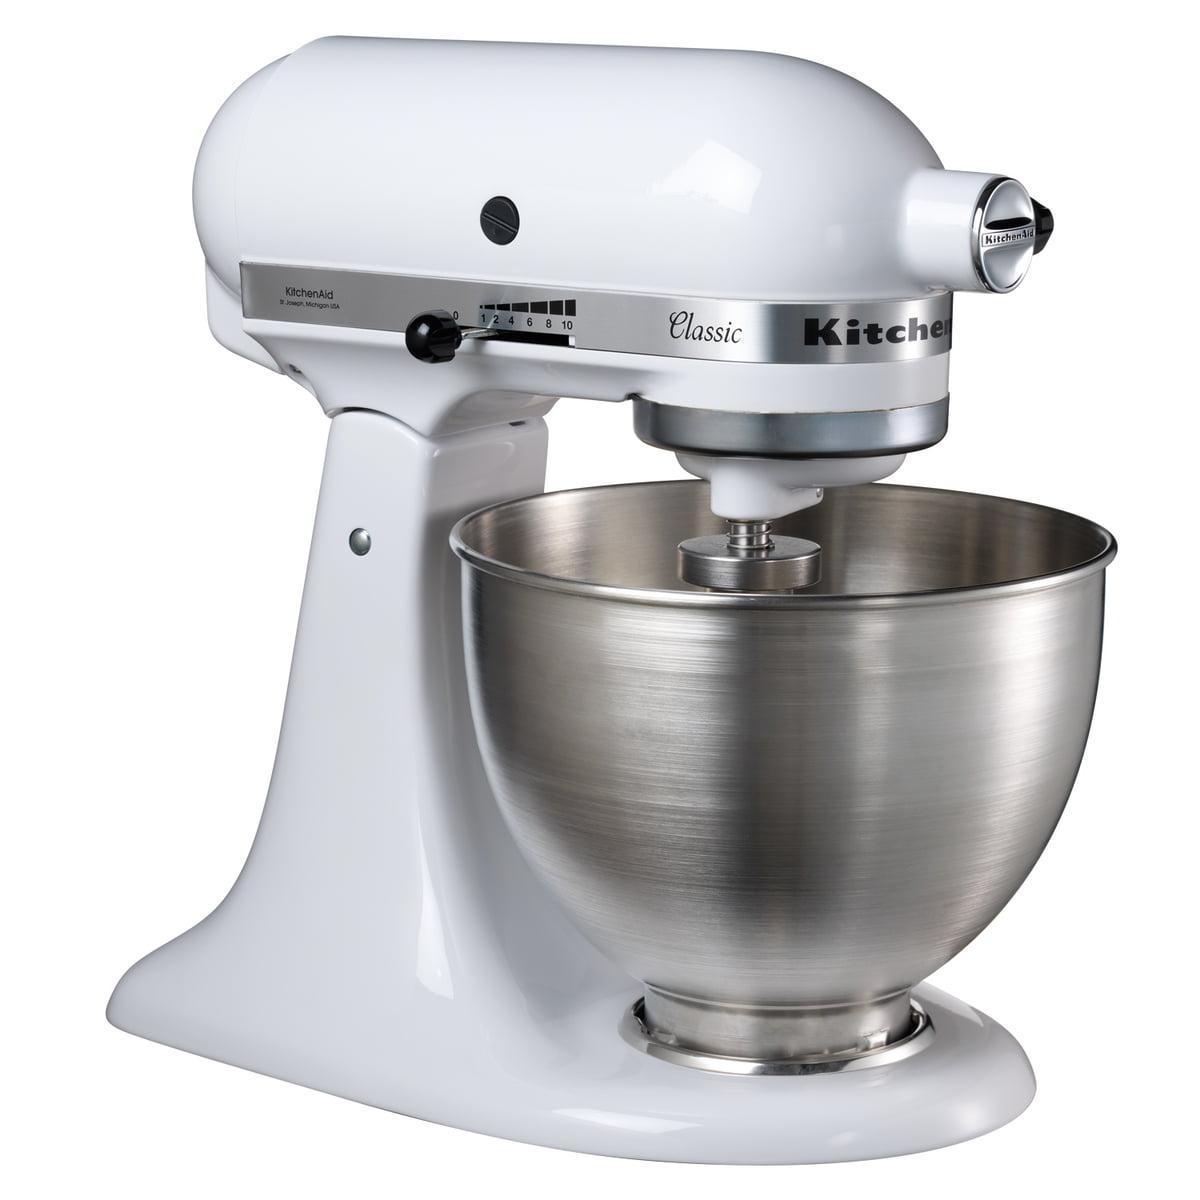 Classic Kitchen Appliance 4 3 L By Kitchenaid